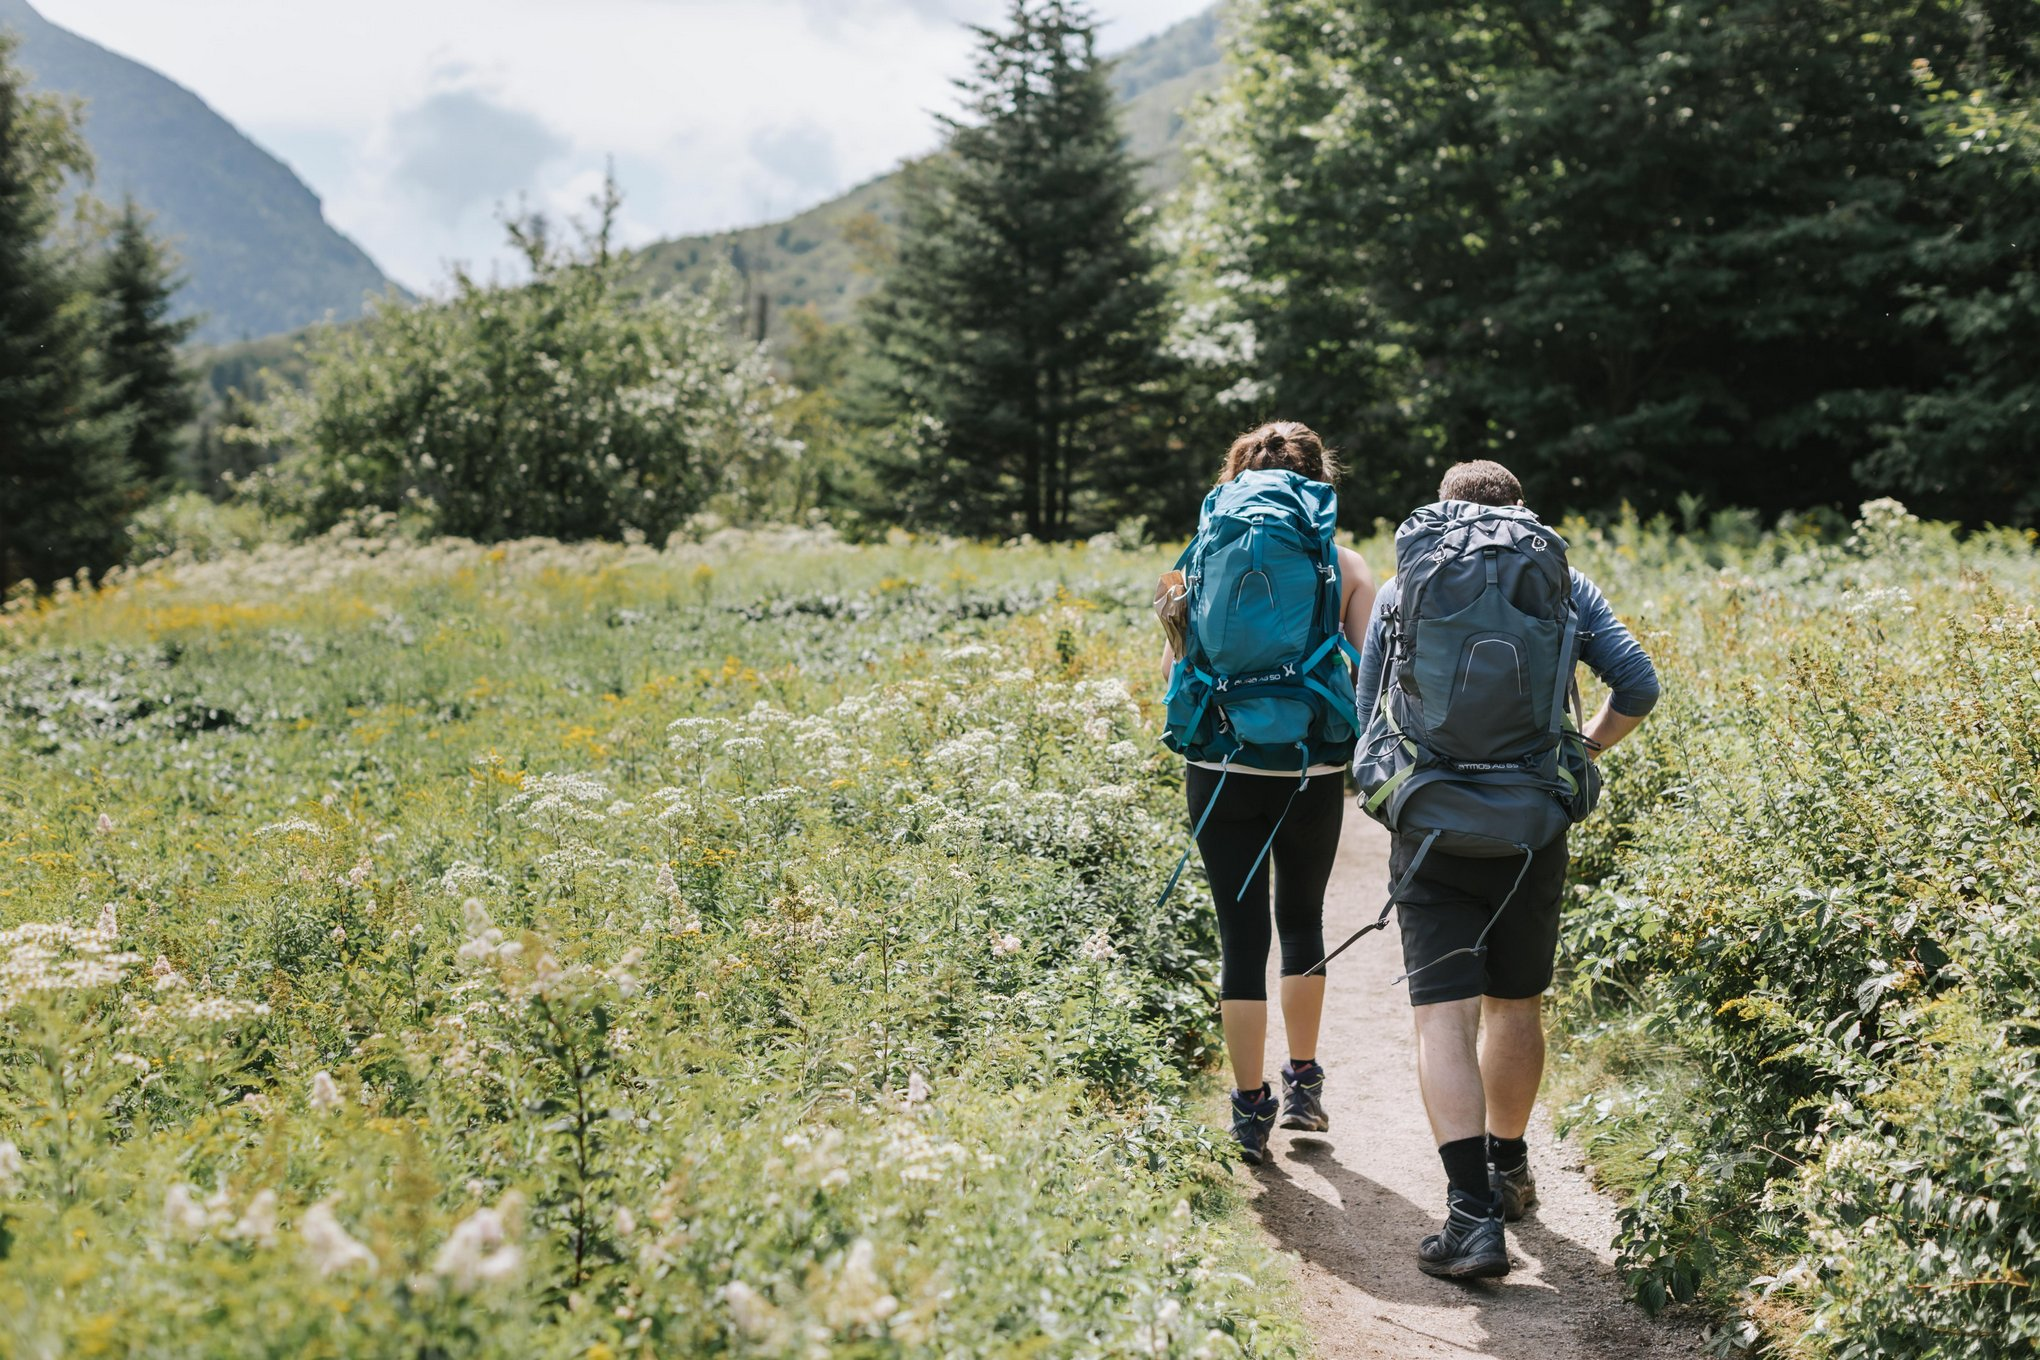 Mount-Willard-White-Mountains-Engagement-Elopement-Lena-Mirisola-9.JPG